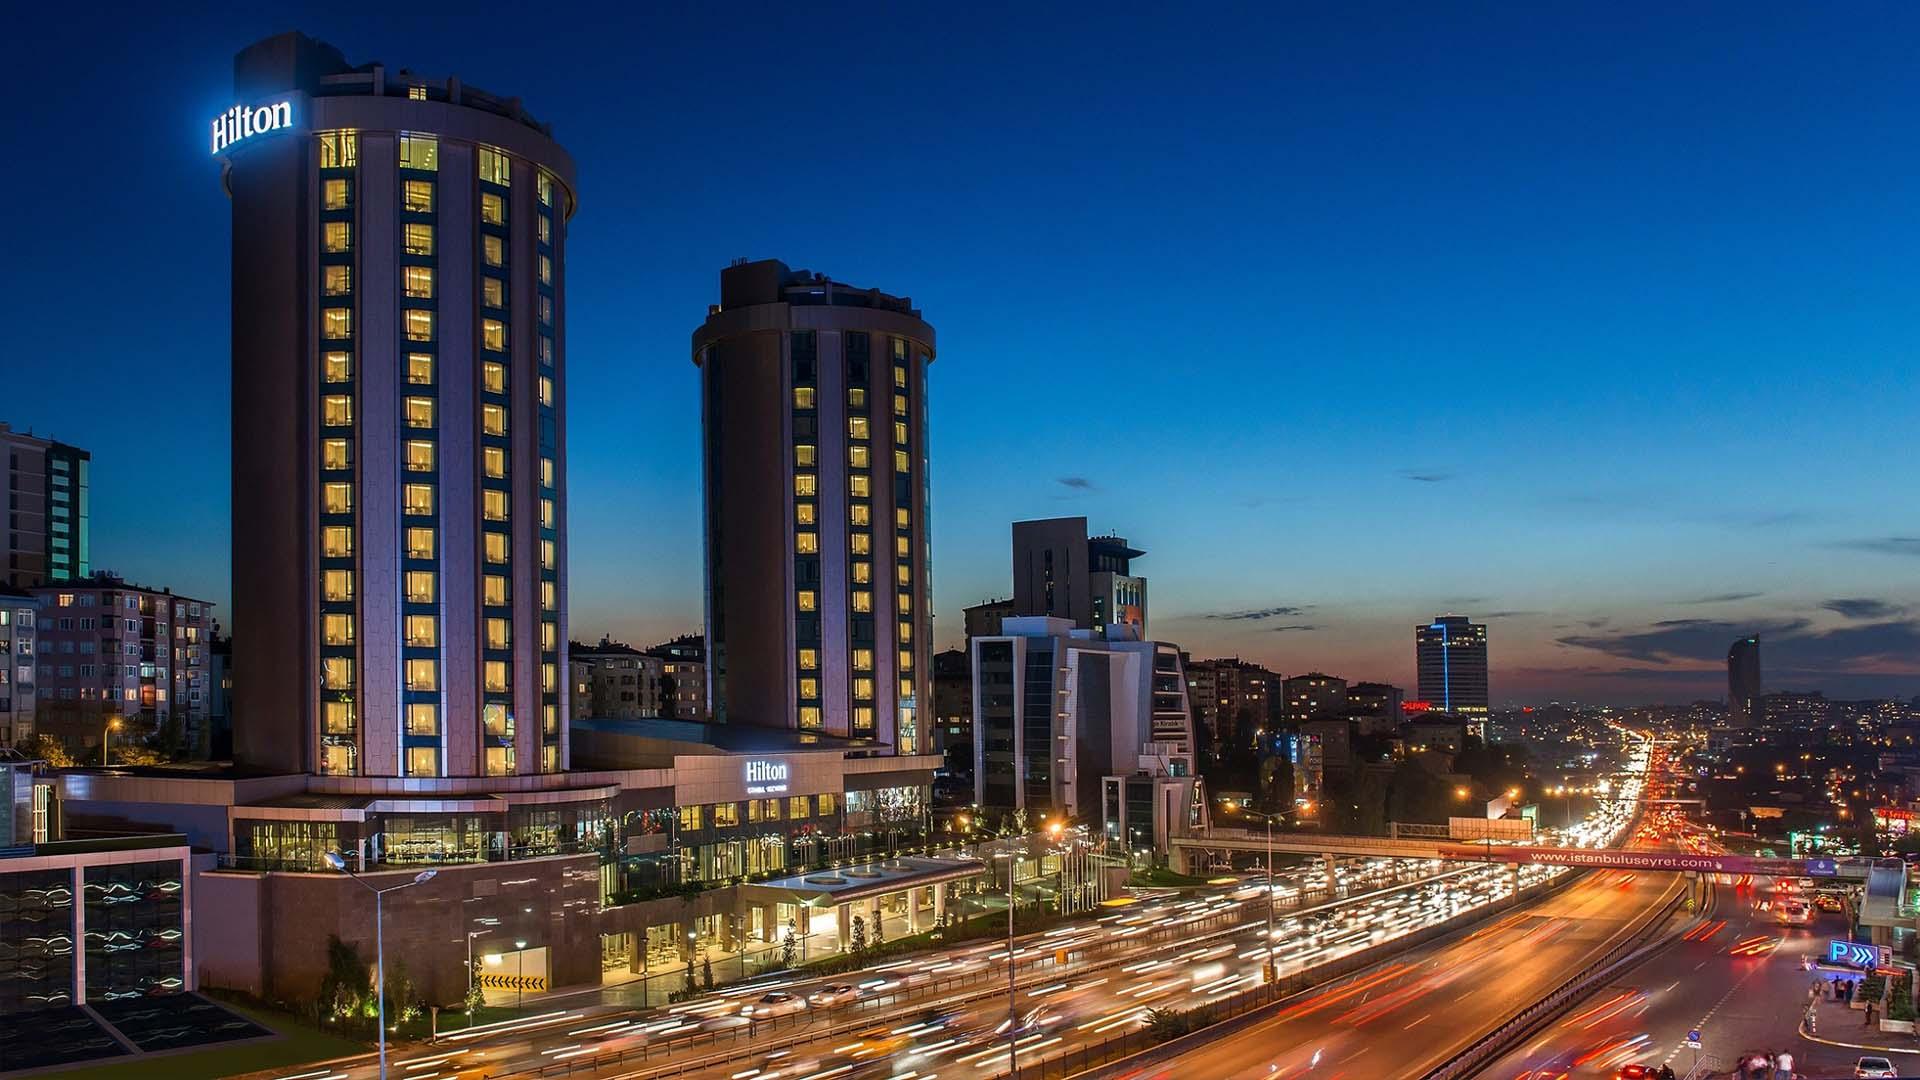 Hilton Kozyatağı